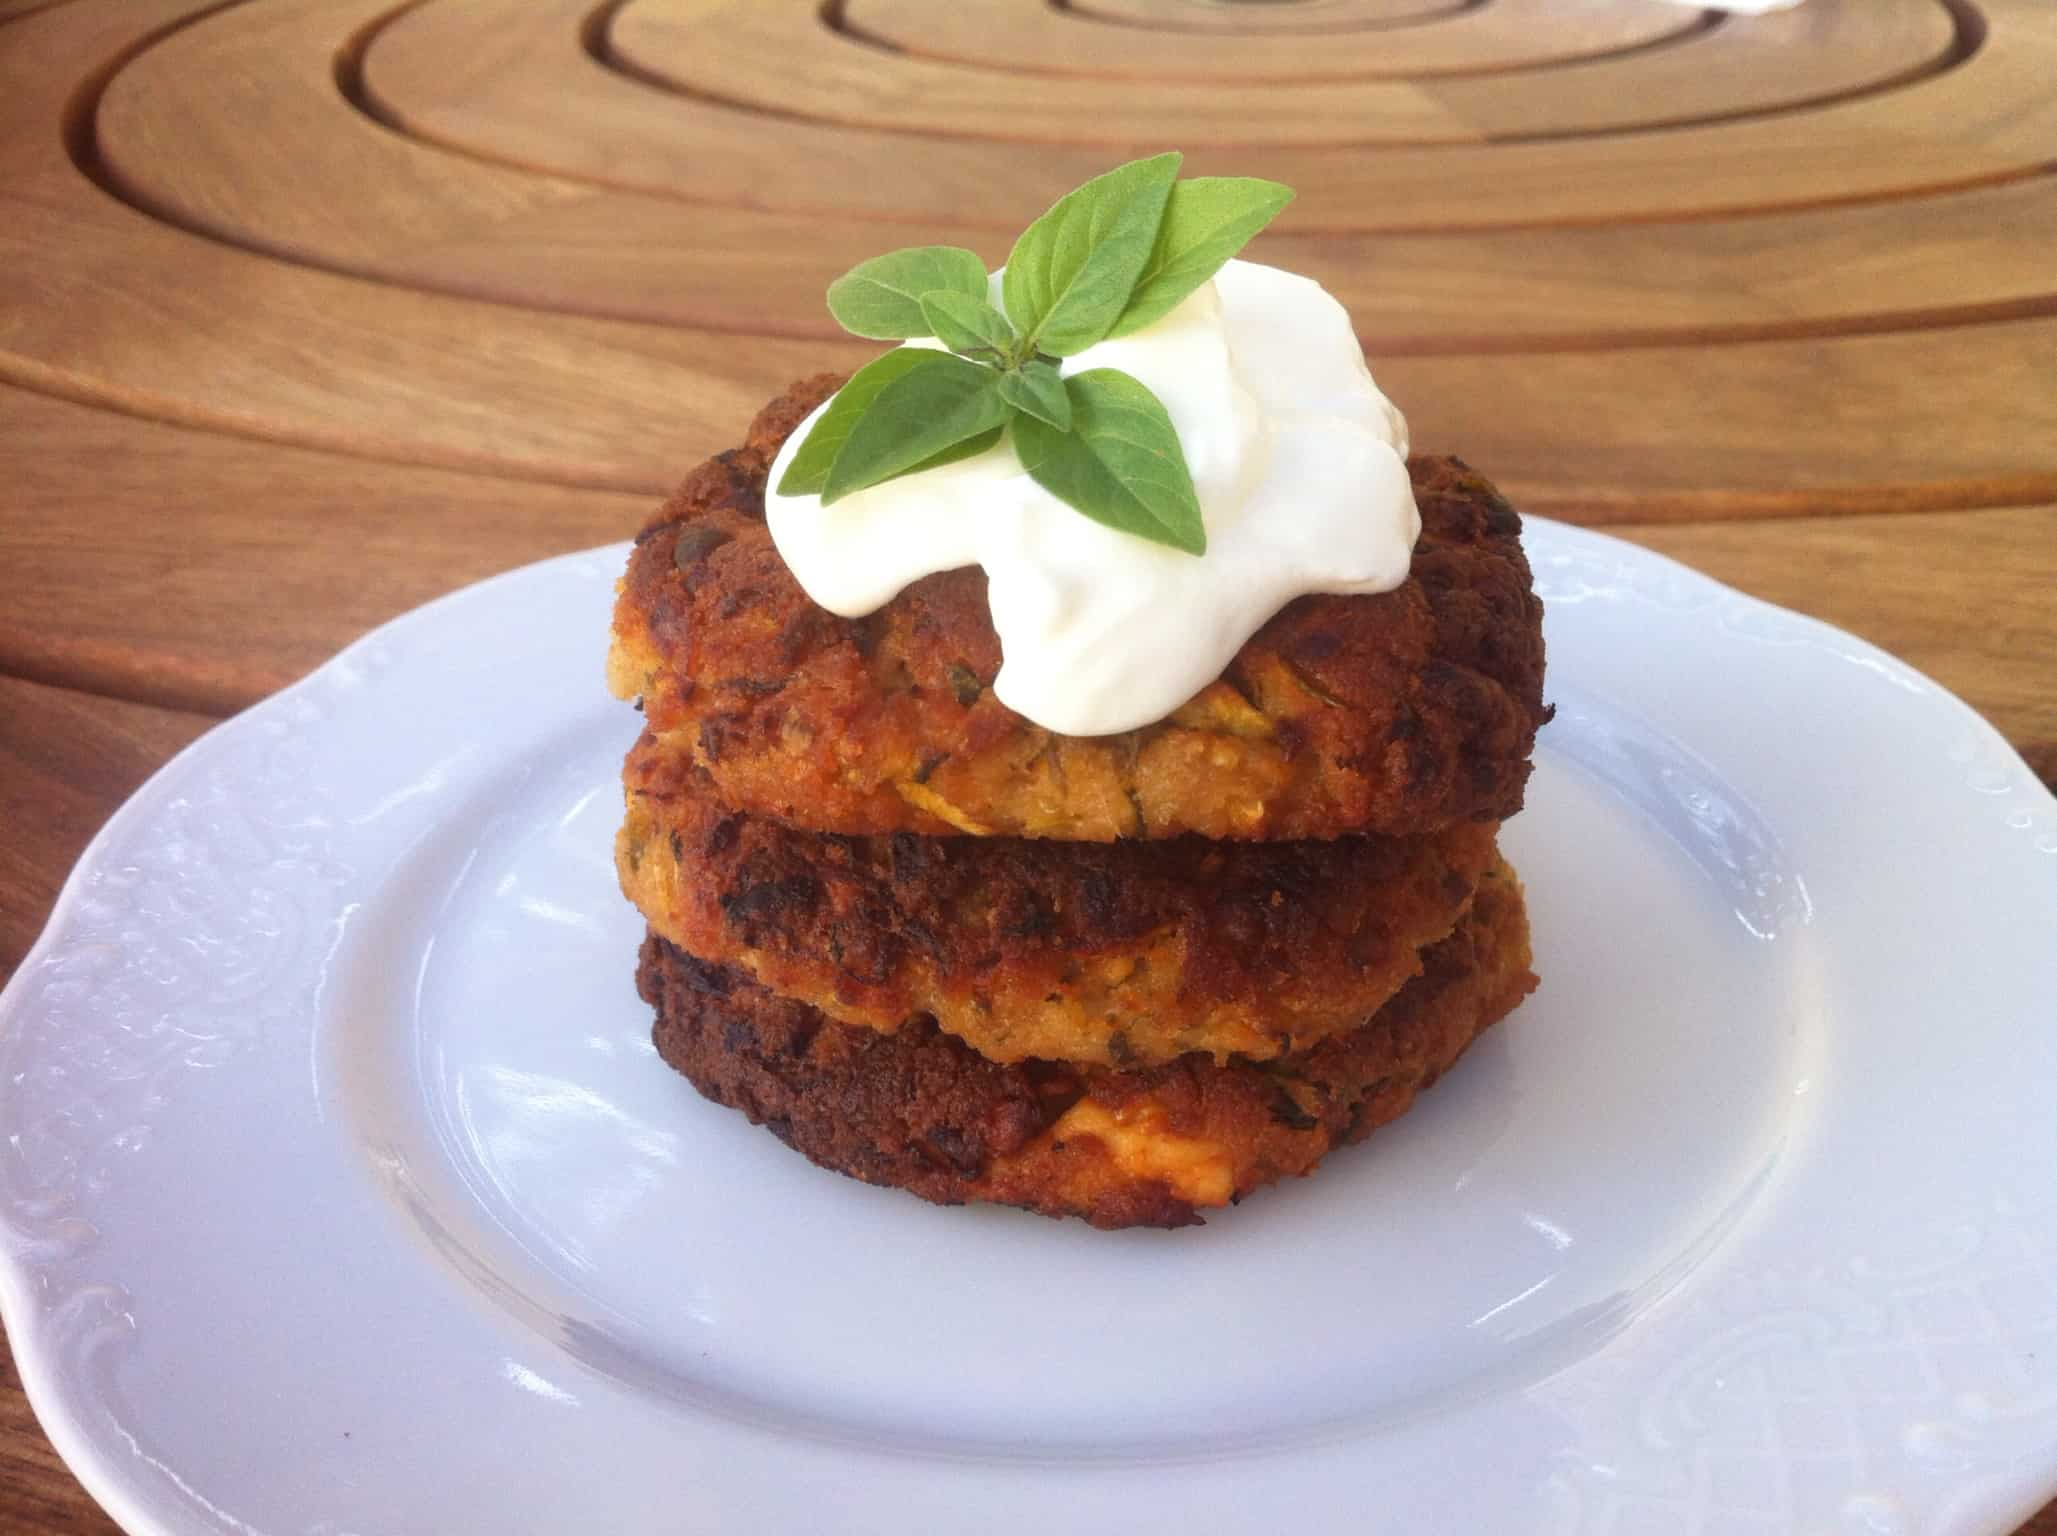 ... (Fried Zucchini/Courgette Balls) Recipe - My Greek Dish